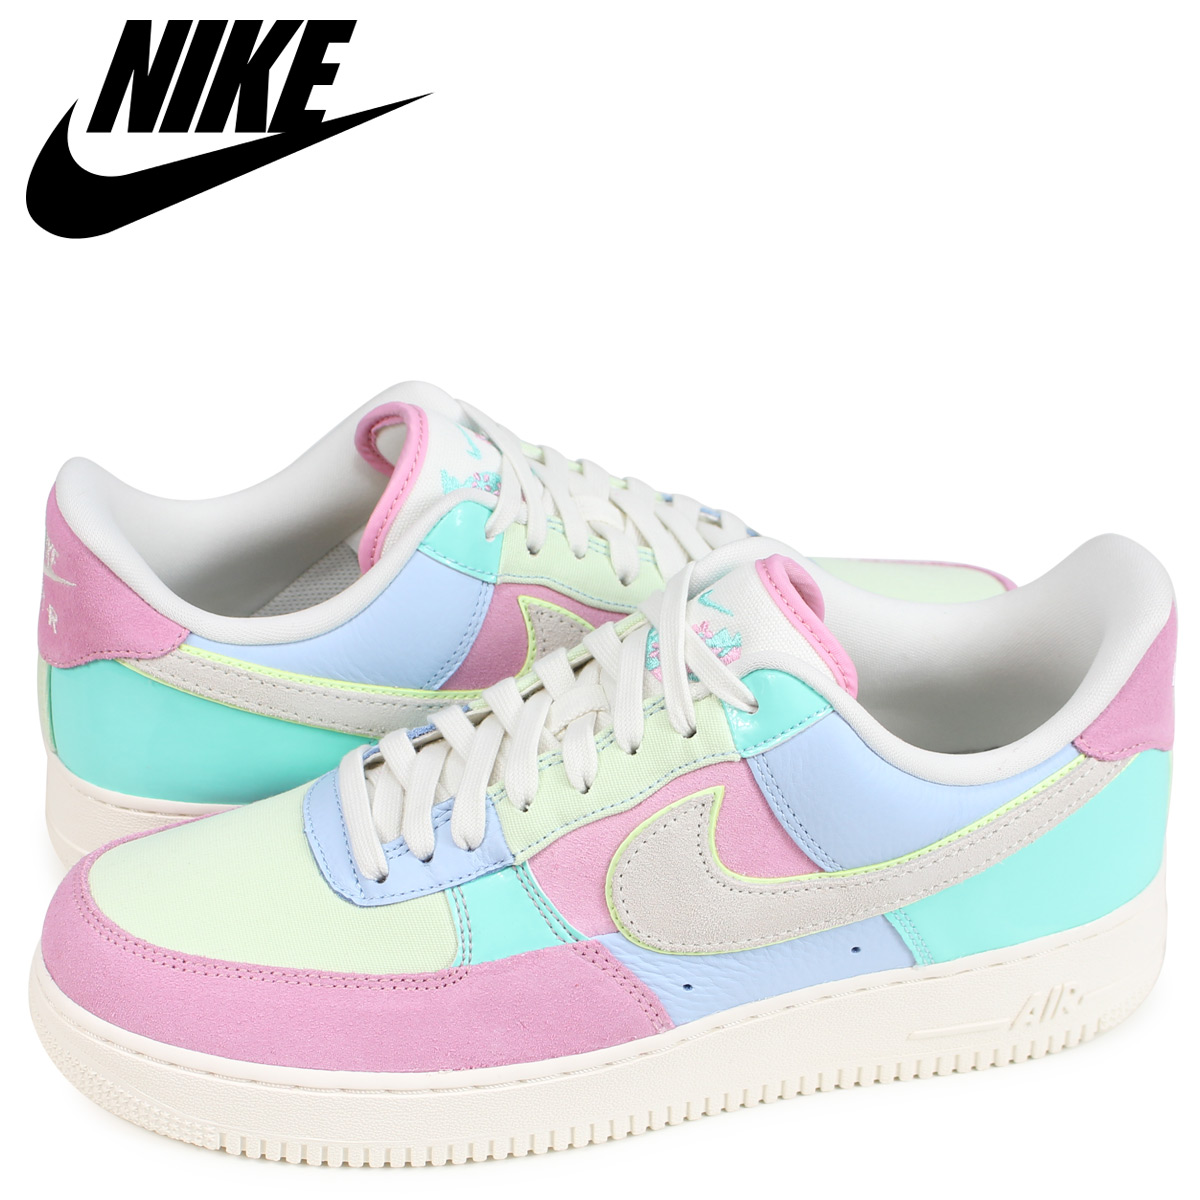 NIKE AIR FORCE 1 LOW EASTER EGG Nike air force 1 sneakers men pink AH8462 400